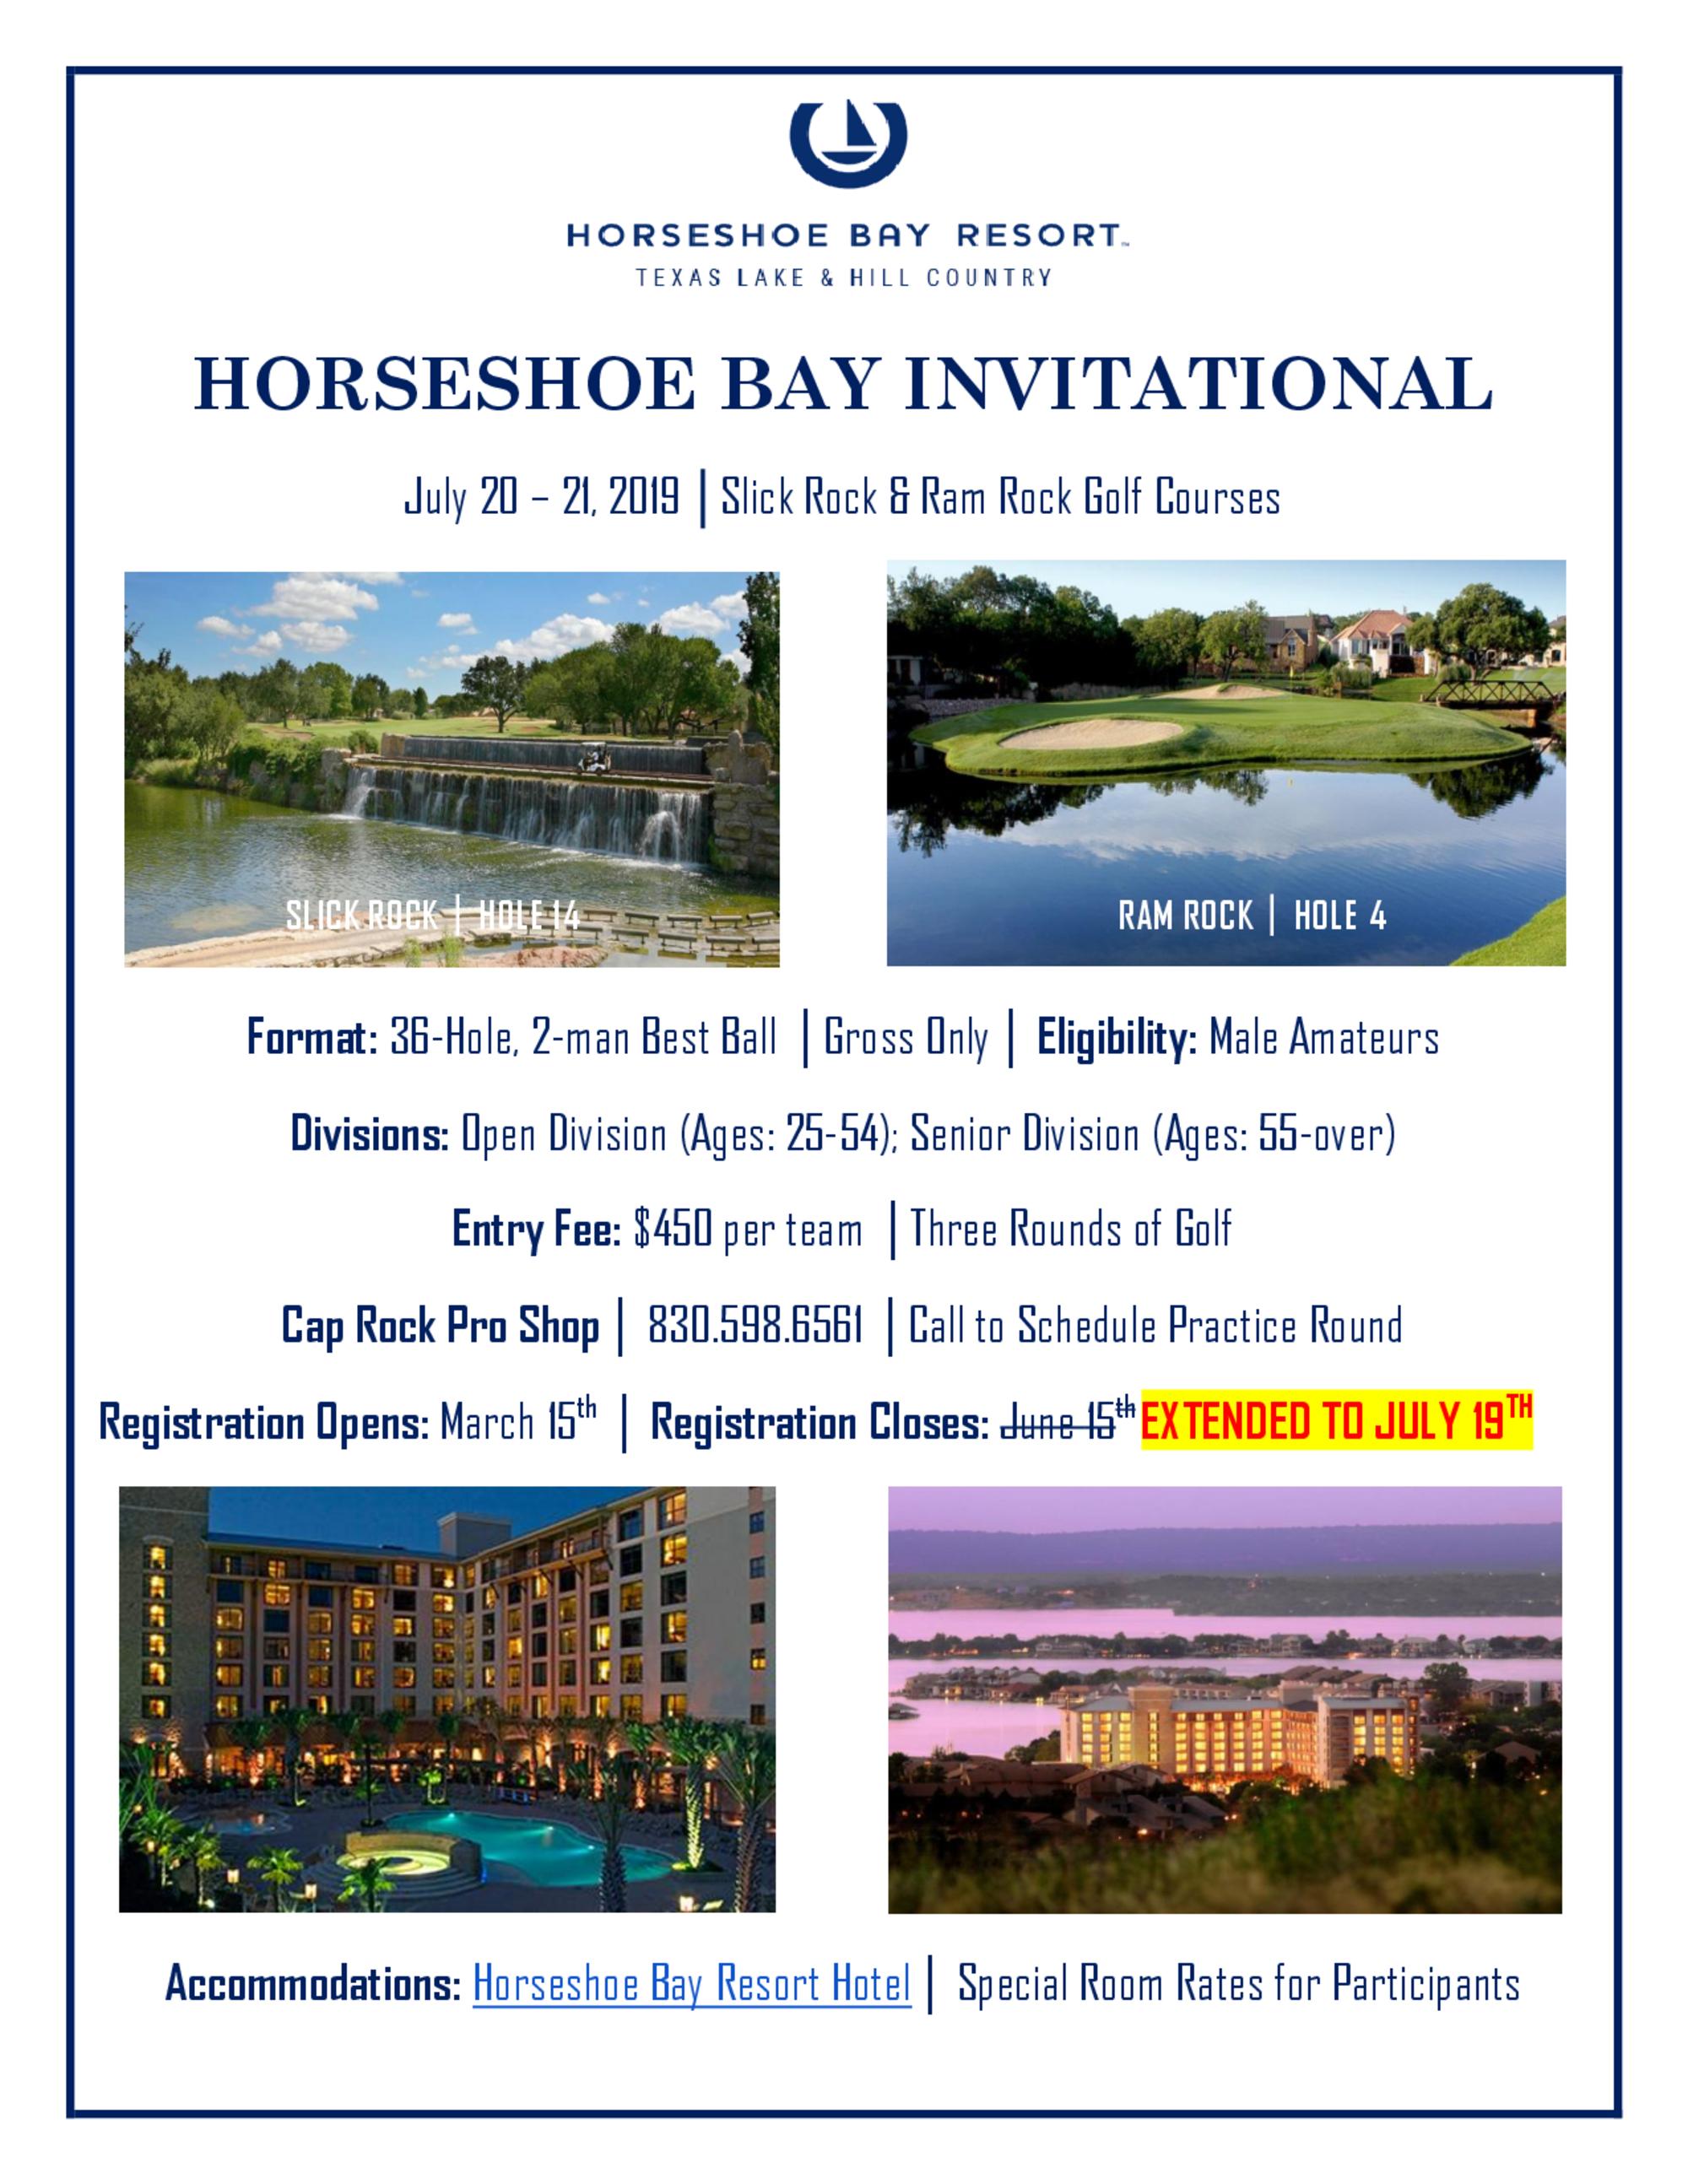 Horseshoe bay invitational flyer 1